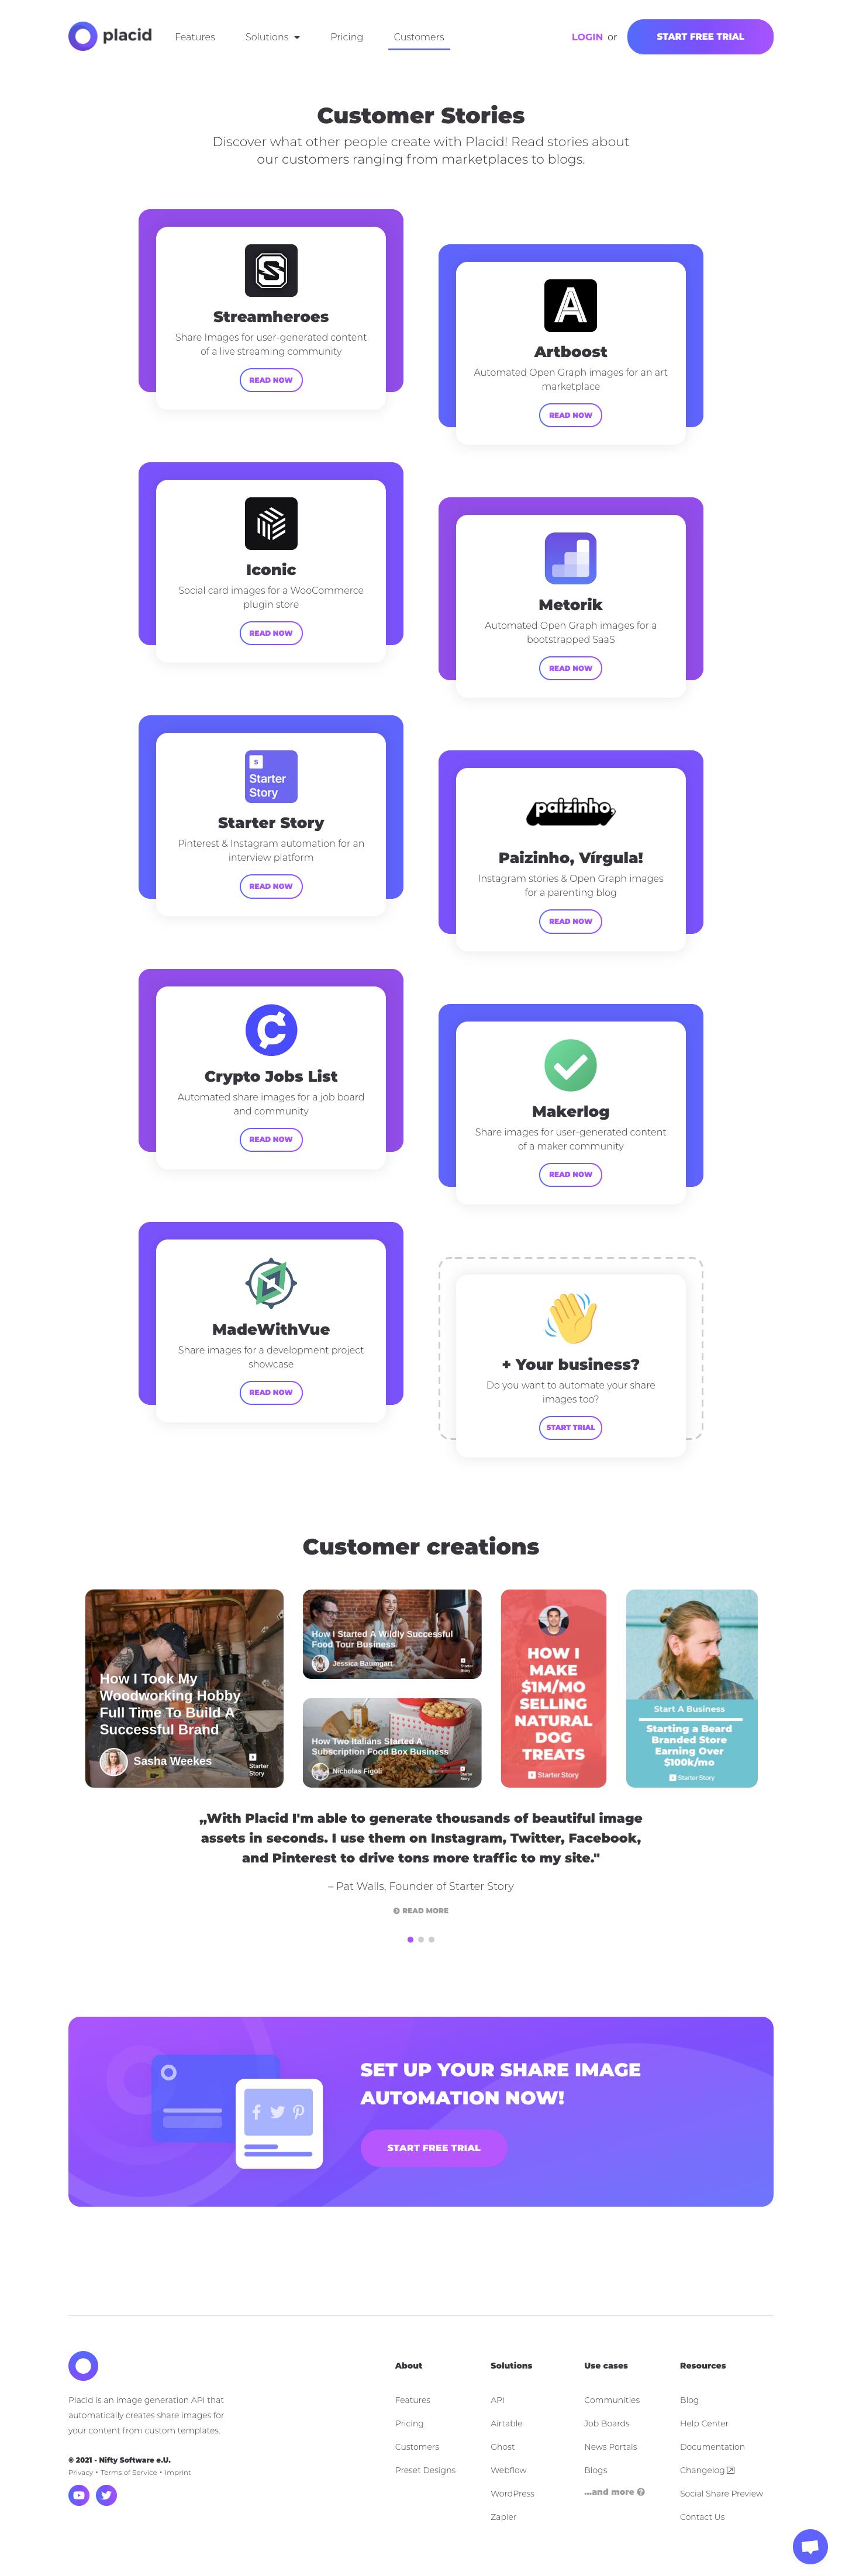 Placid Customers Page